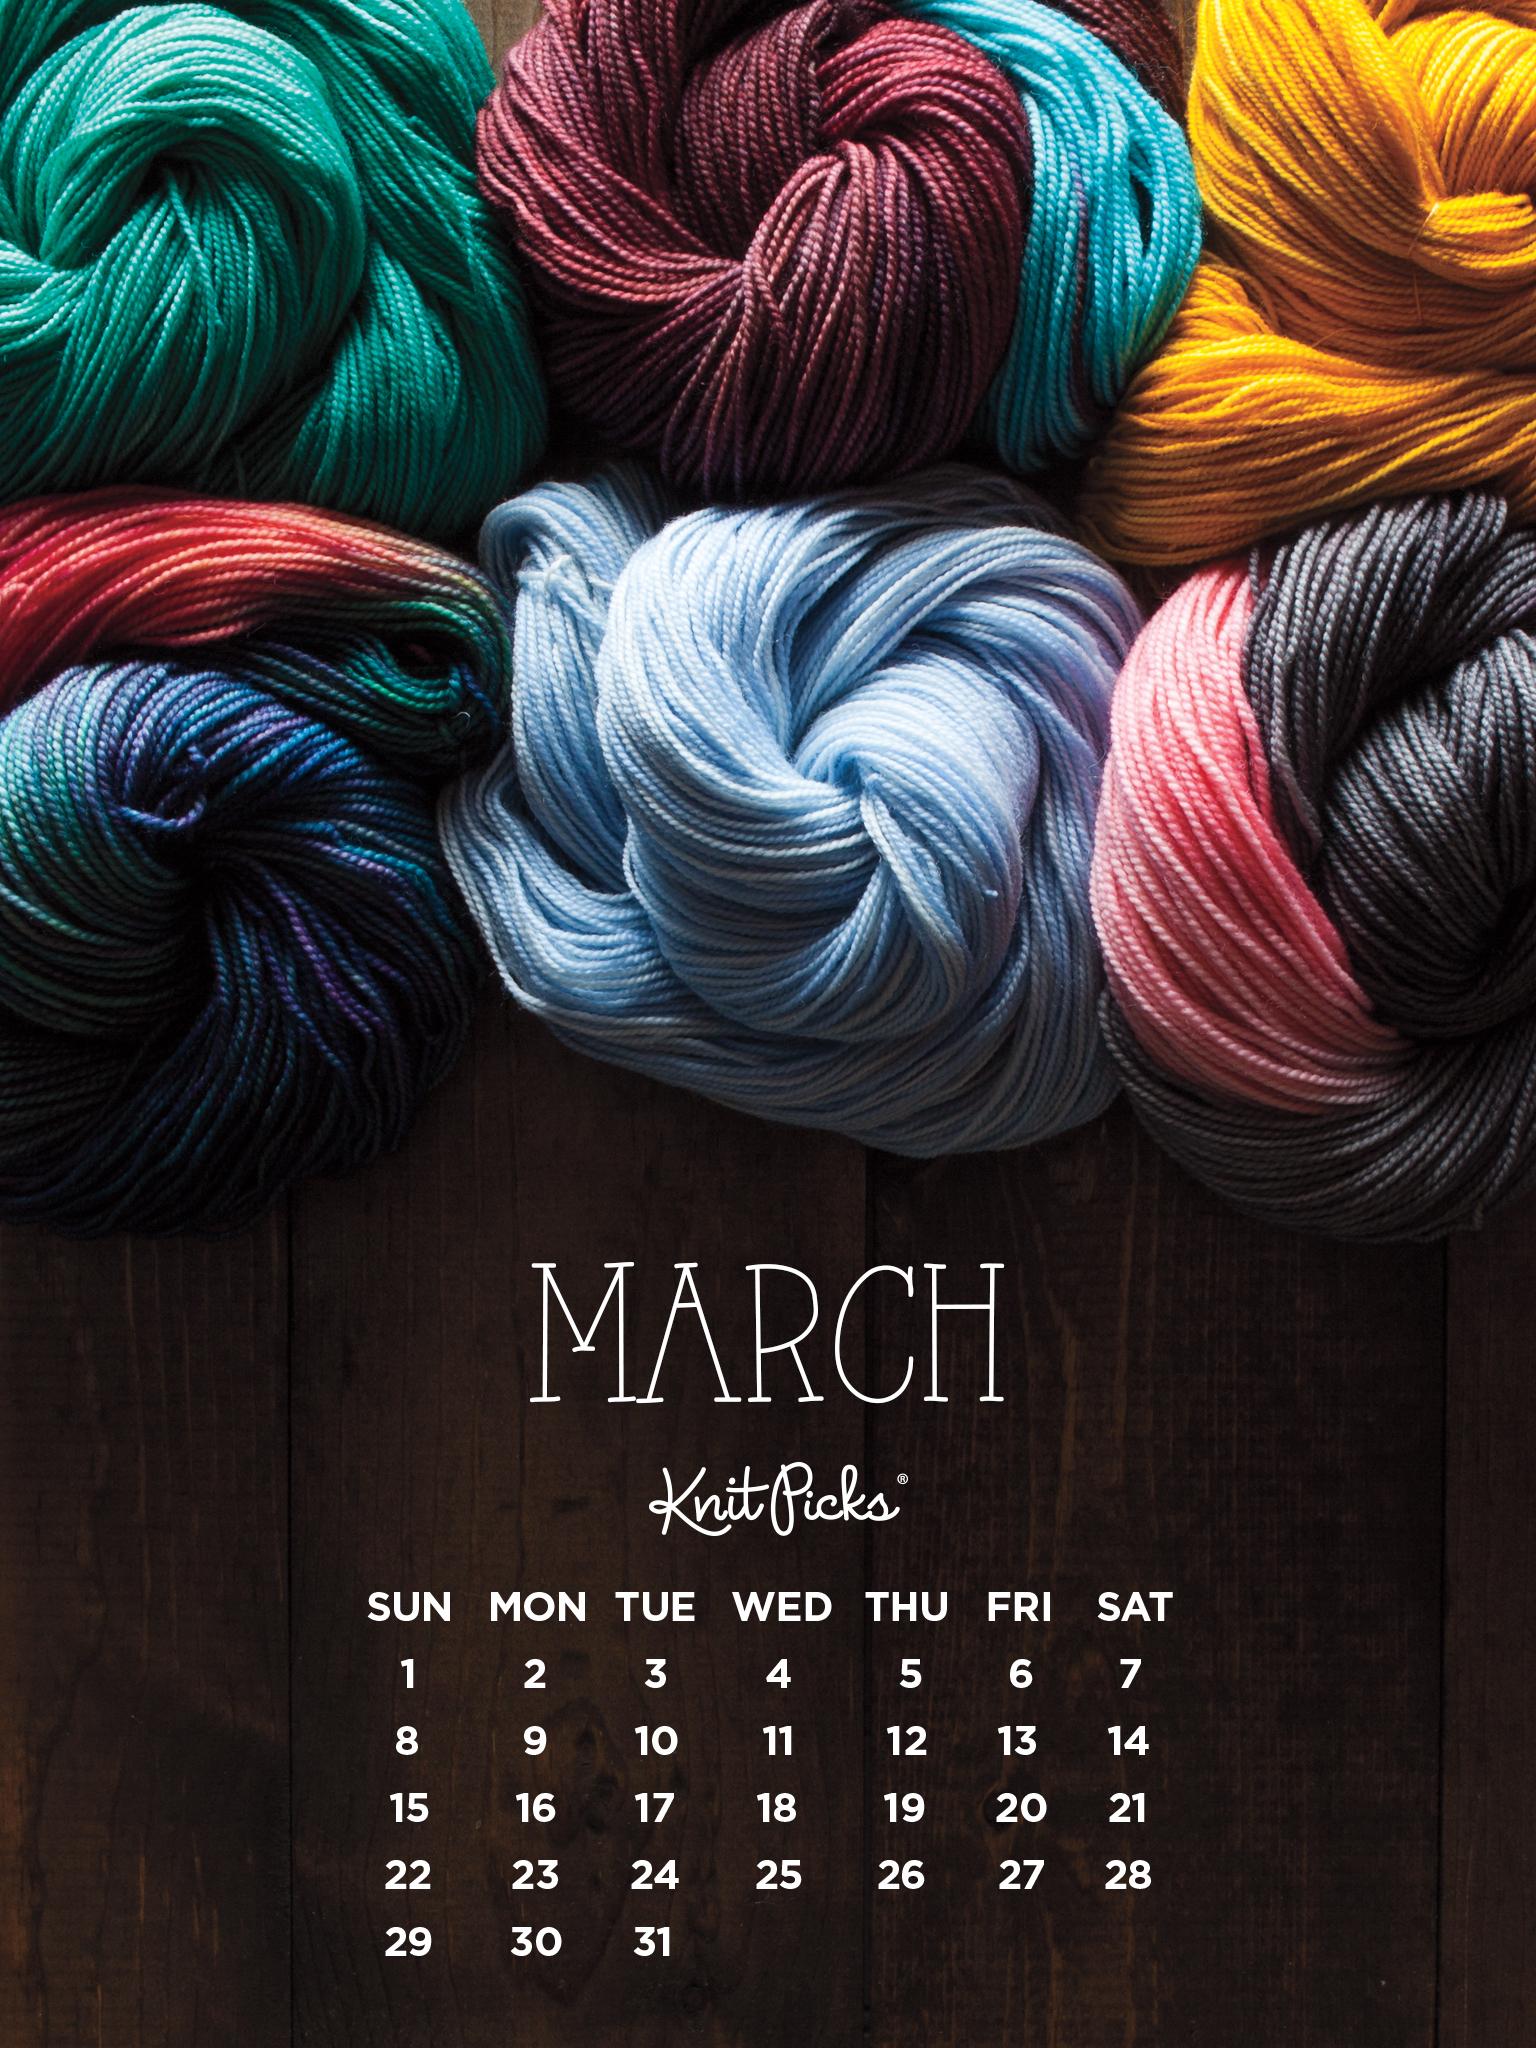 March 2015 Wallpaper Calendar   KnitPicks Staff Knitting Blog 1536x2048